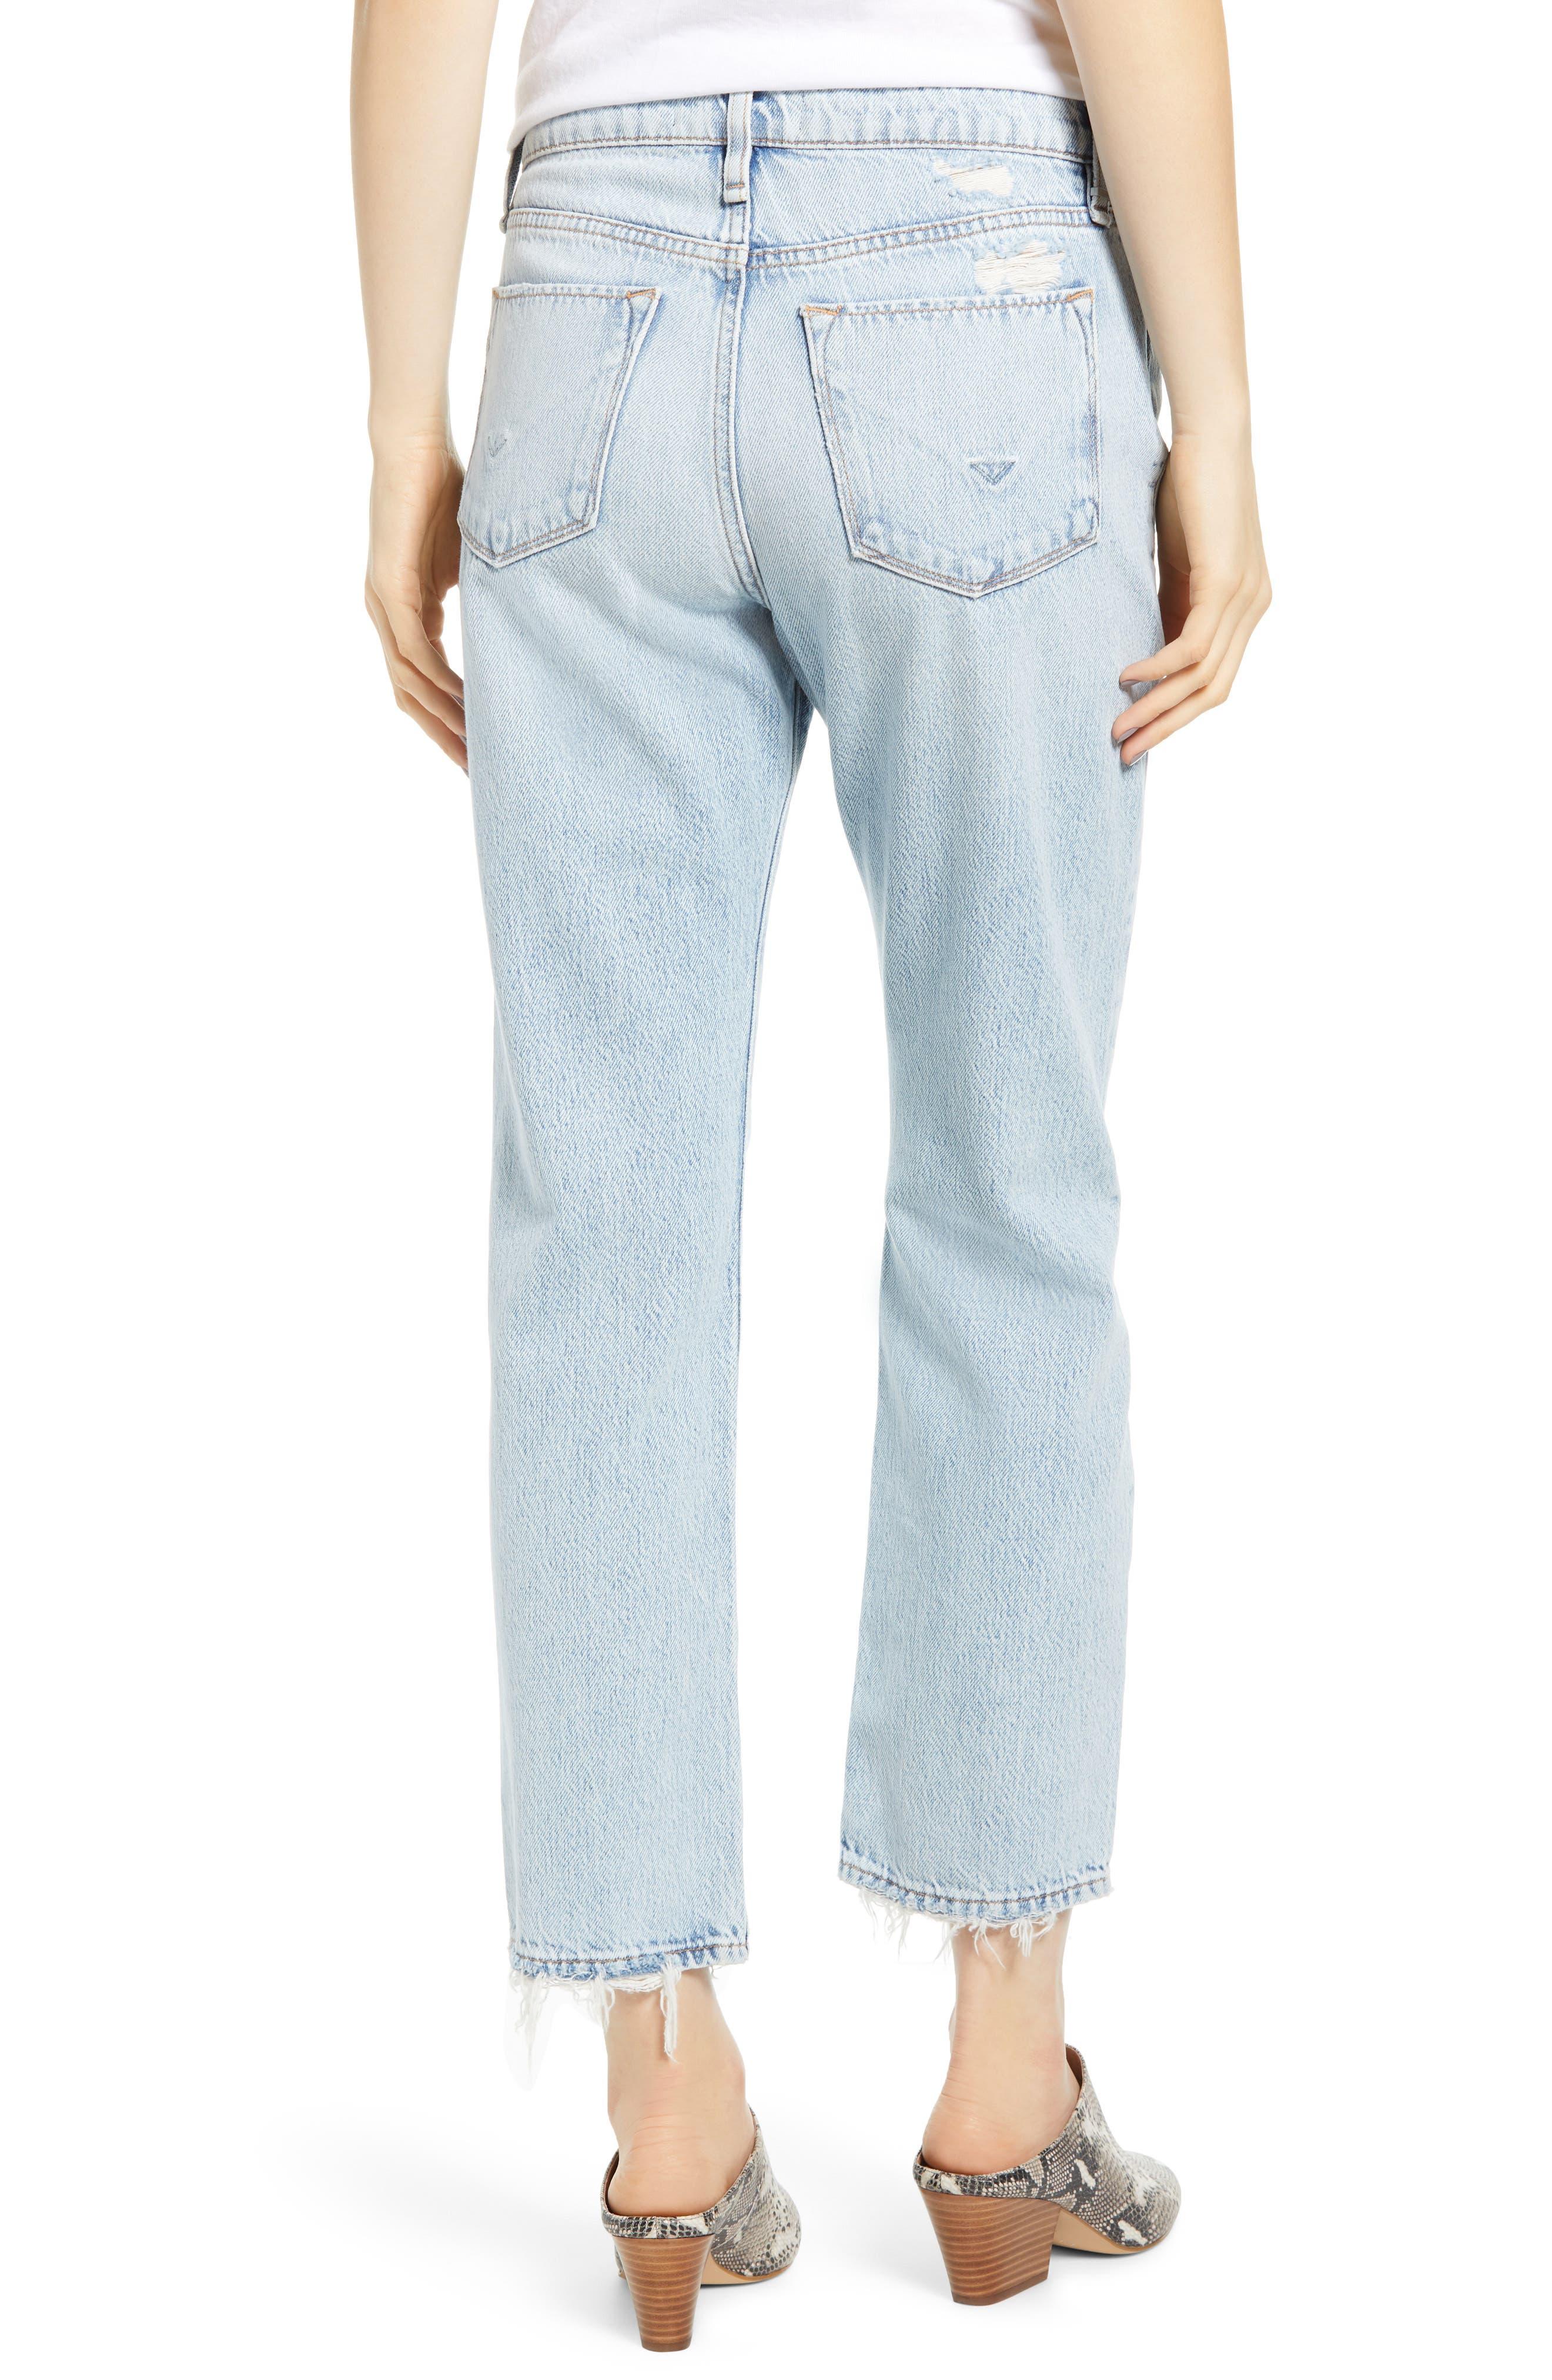 HUDSON JEANS, Jessi Ripped Crop Boyfriend Jeans, Alternate thumbnail 2, color, SAVE TONIGHT